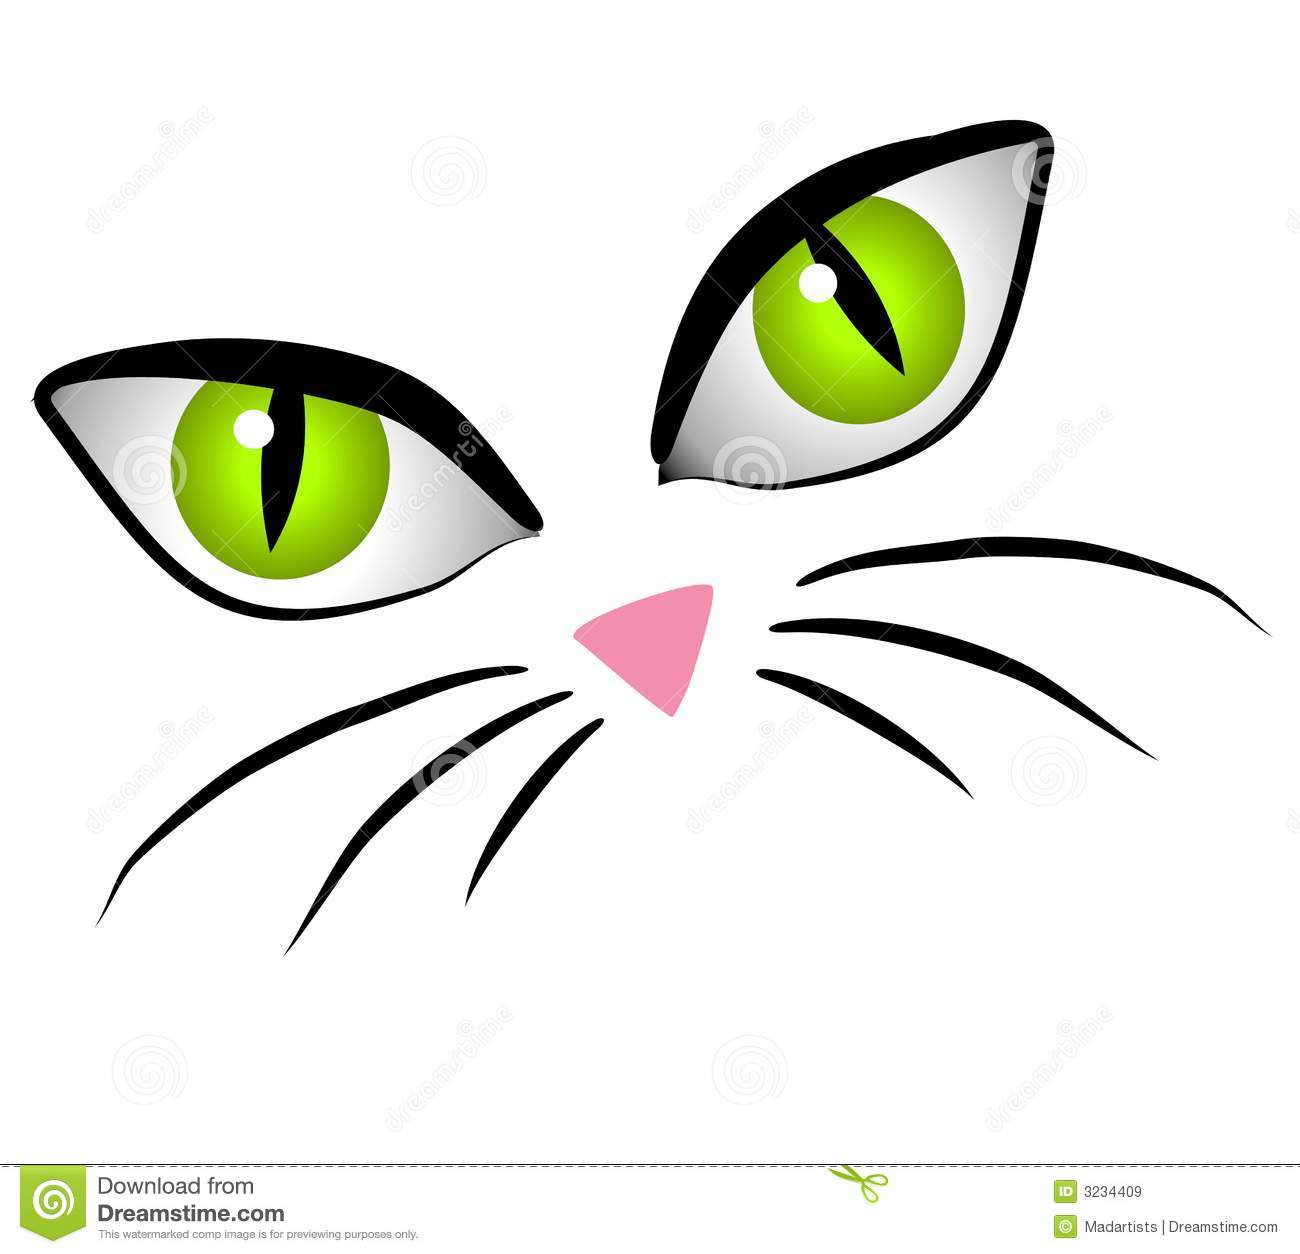 Cartoon Cat Face Clipart Clipart Suggest